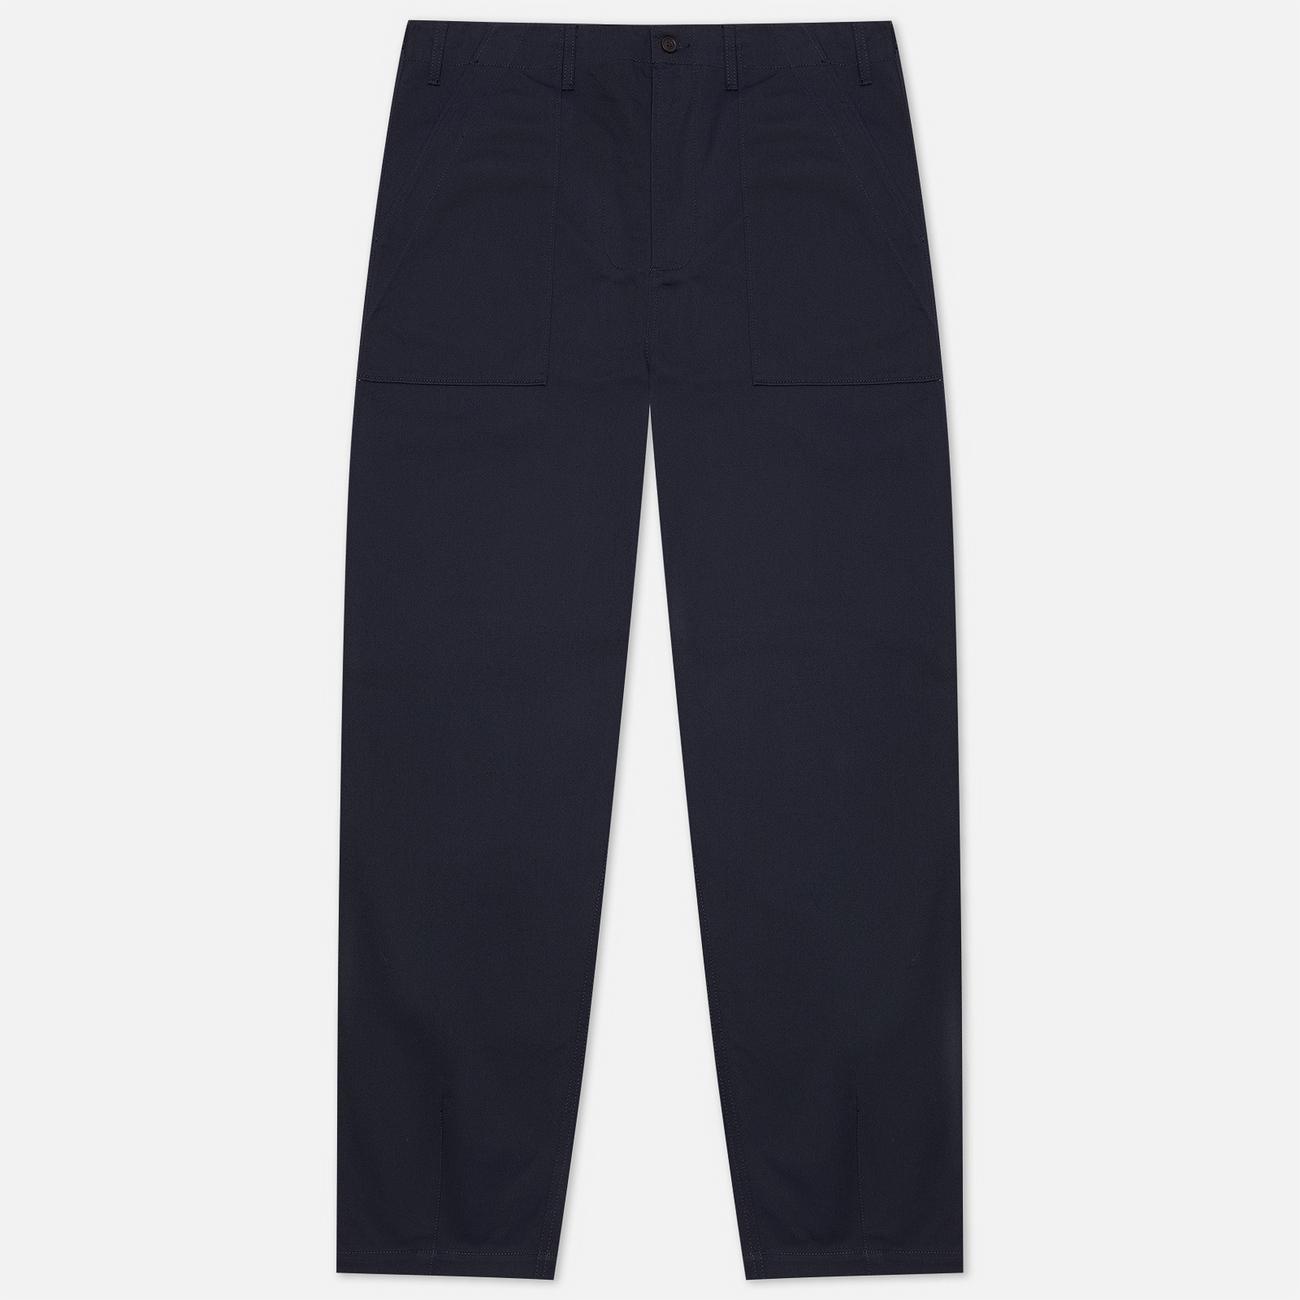 Мужские брюки Universal Works Fatigue Twill Navy